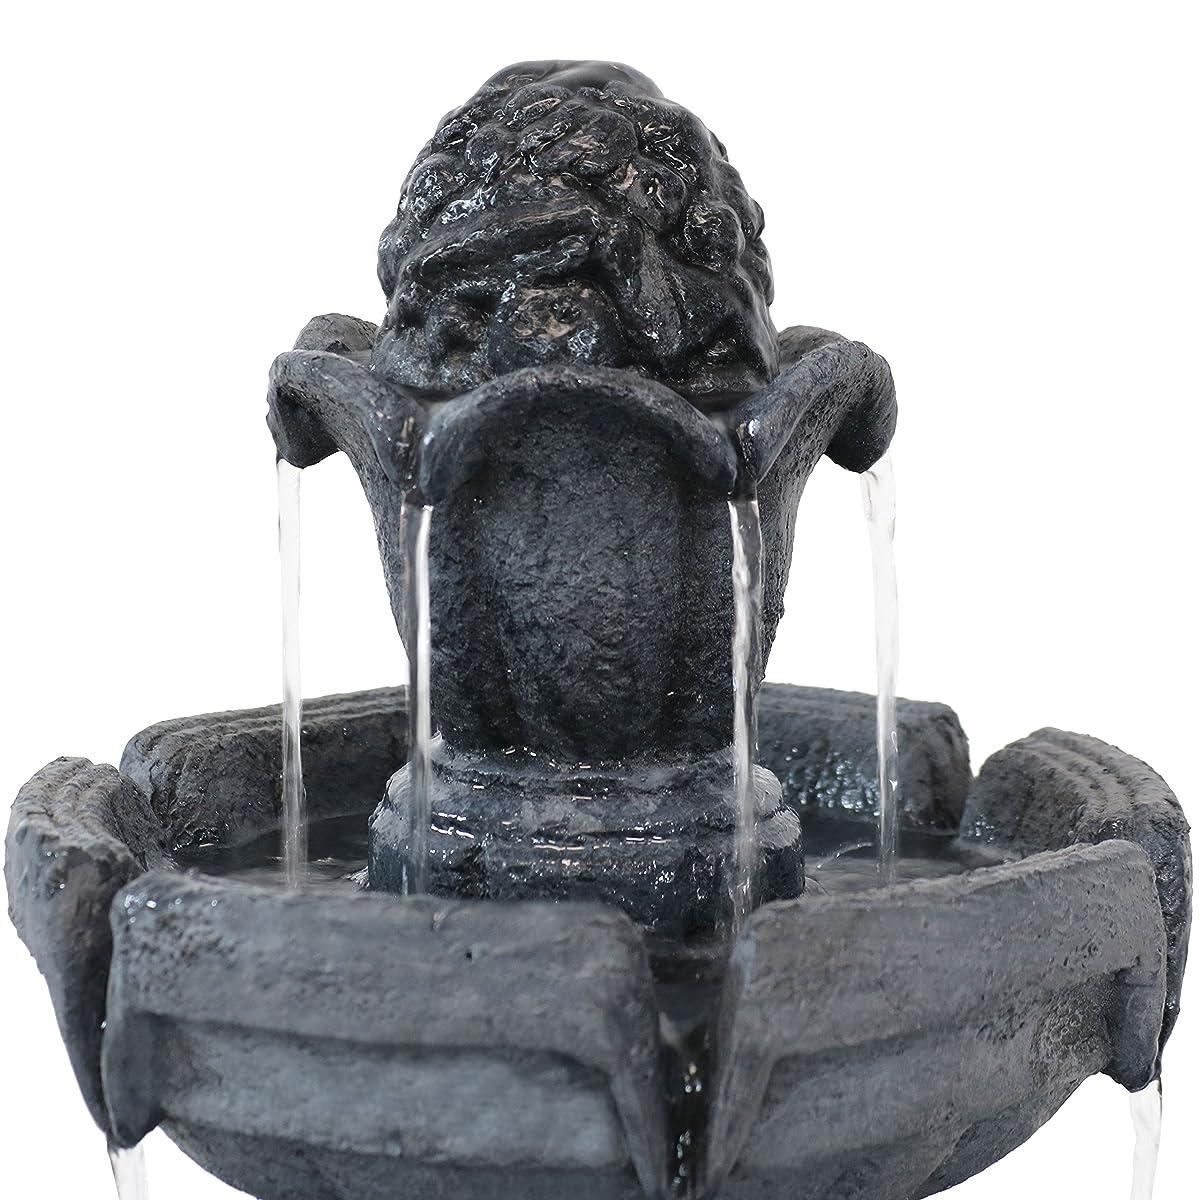 Sunnydaze Budding Fruition 3-Tier Outdoor Water Fountain, 34-Inch